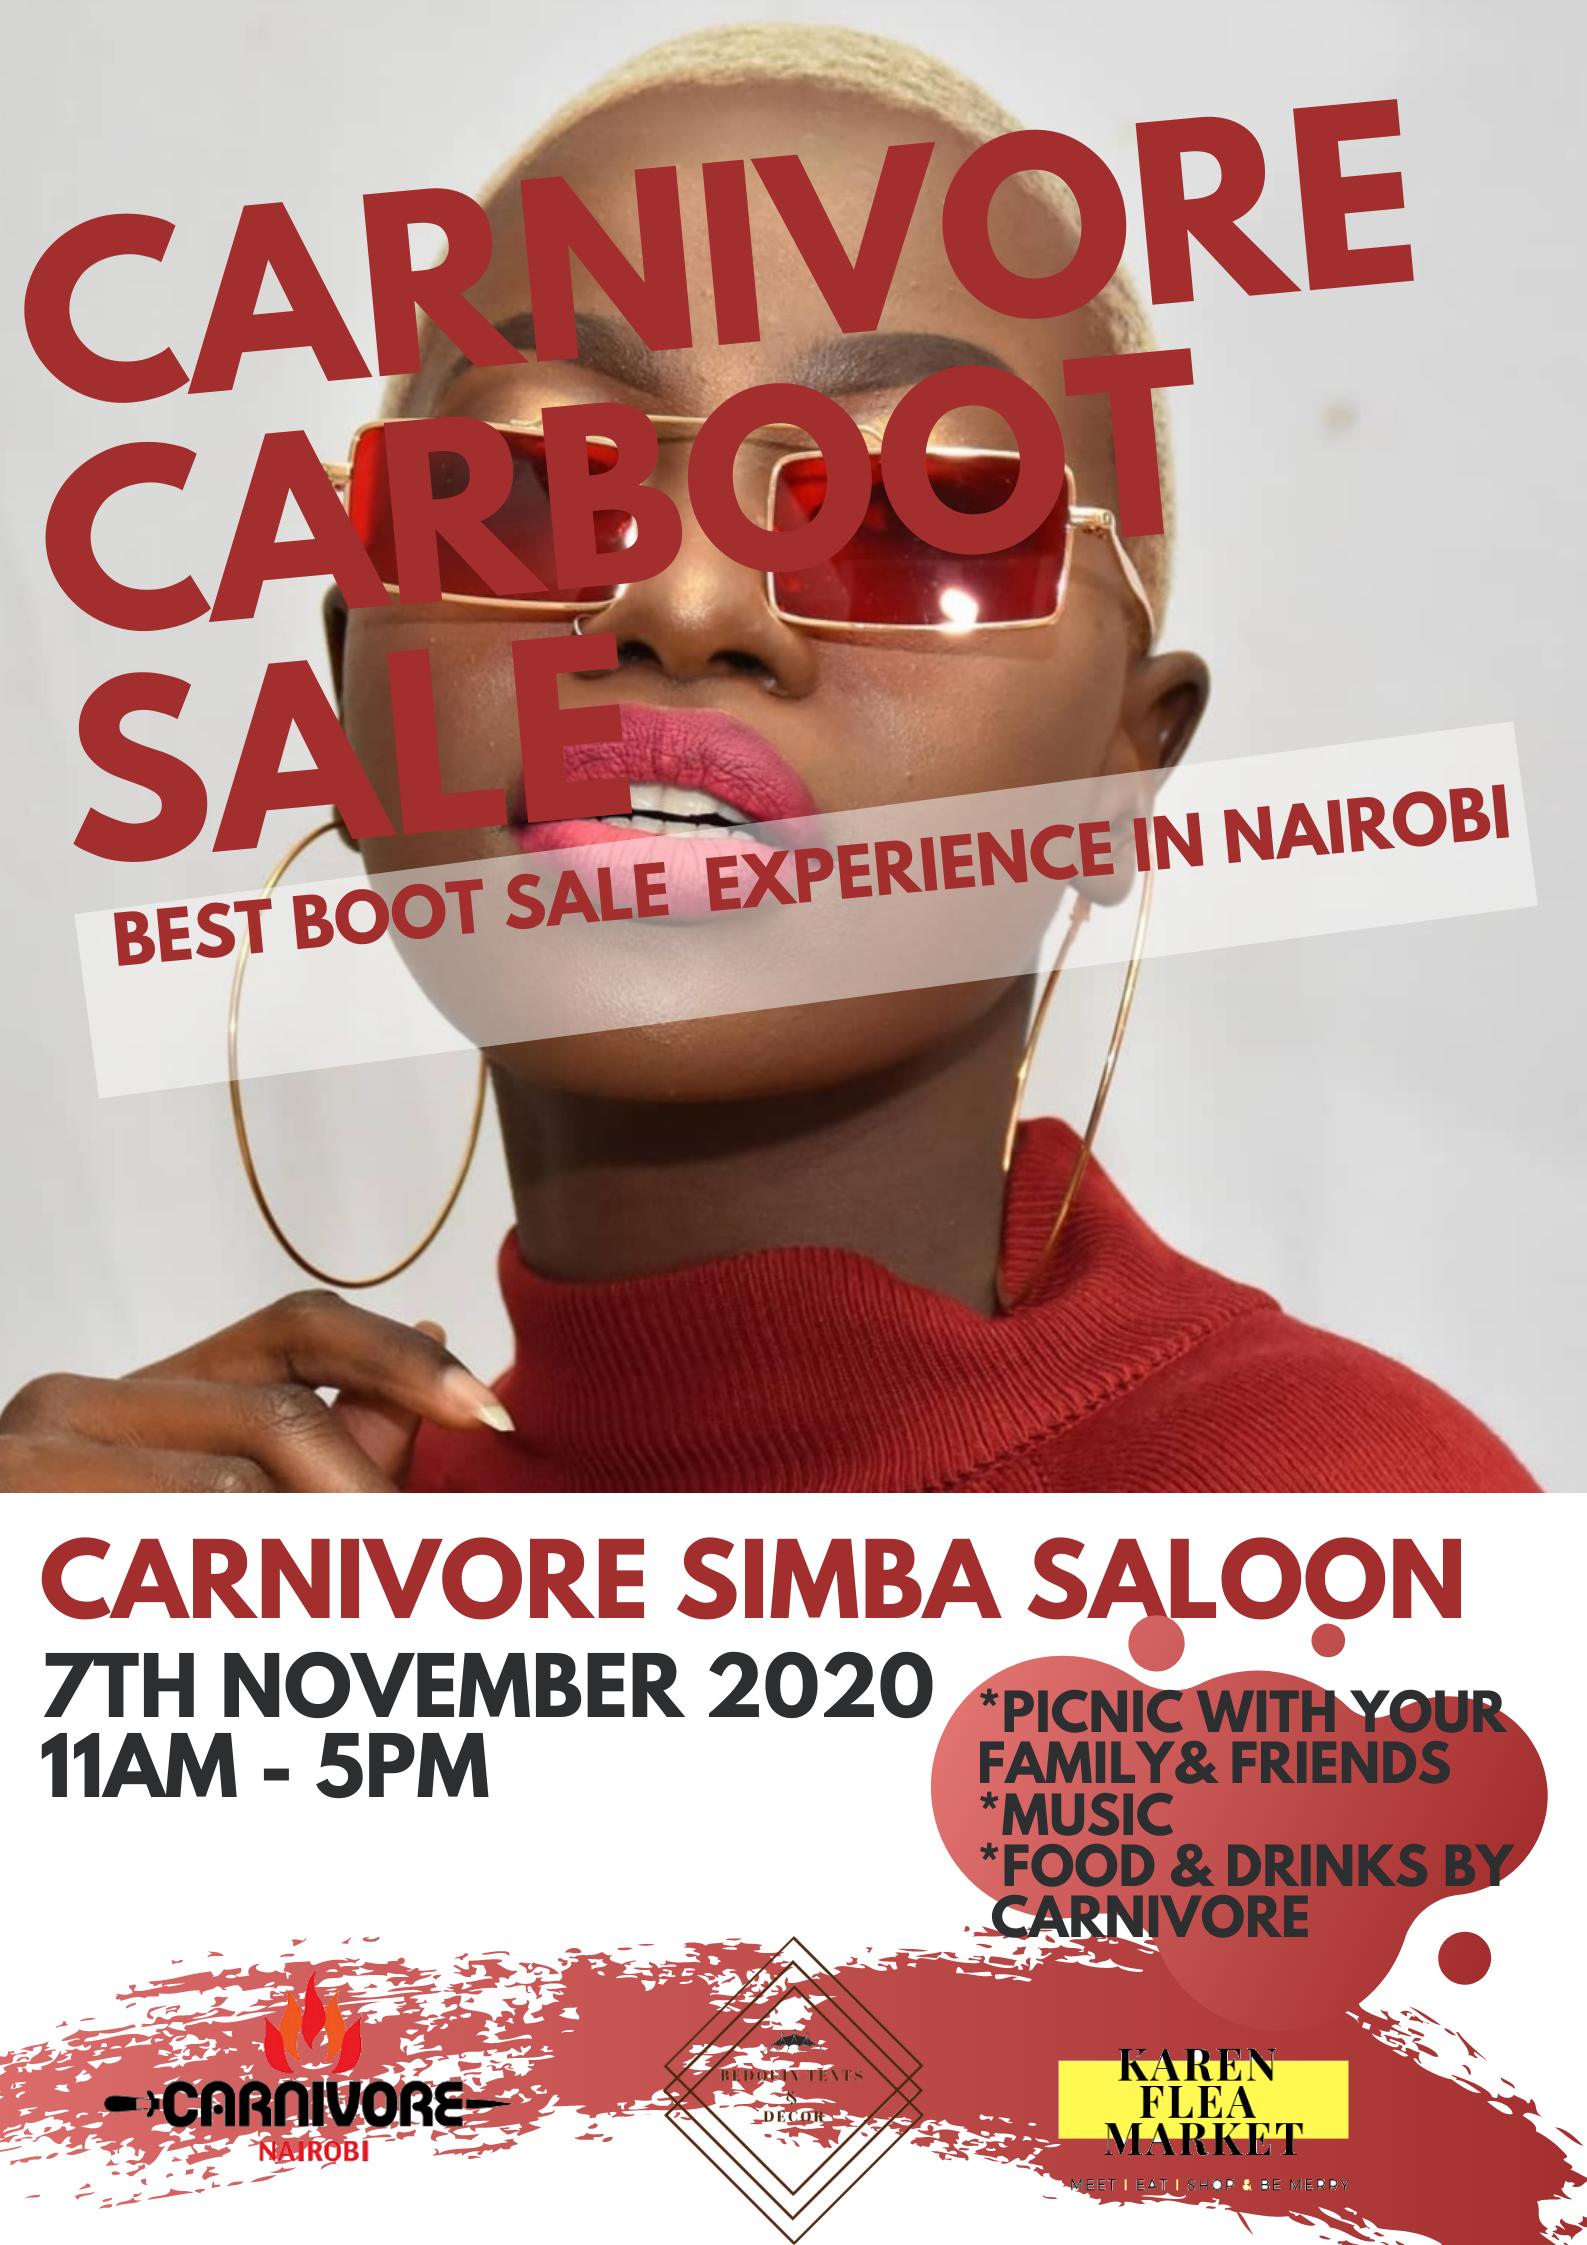 Carnivore Car Boot Sale